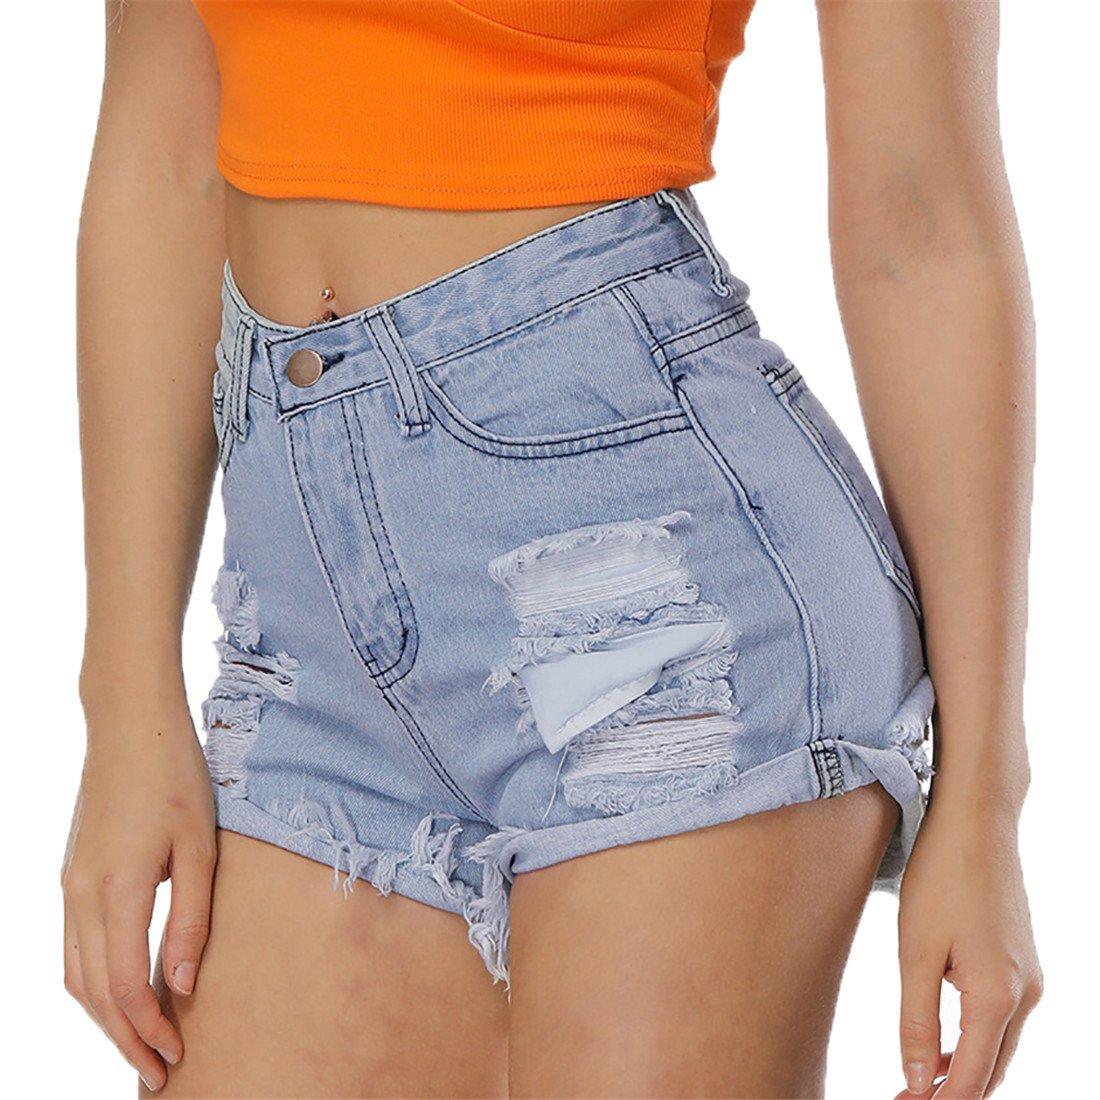 05e9b3e74e NEXLOMOS Women's Juniors High Waisted Ripped Frayed Raw Hem Jean Denim  Shorts